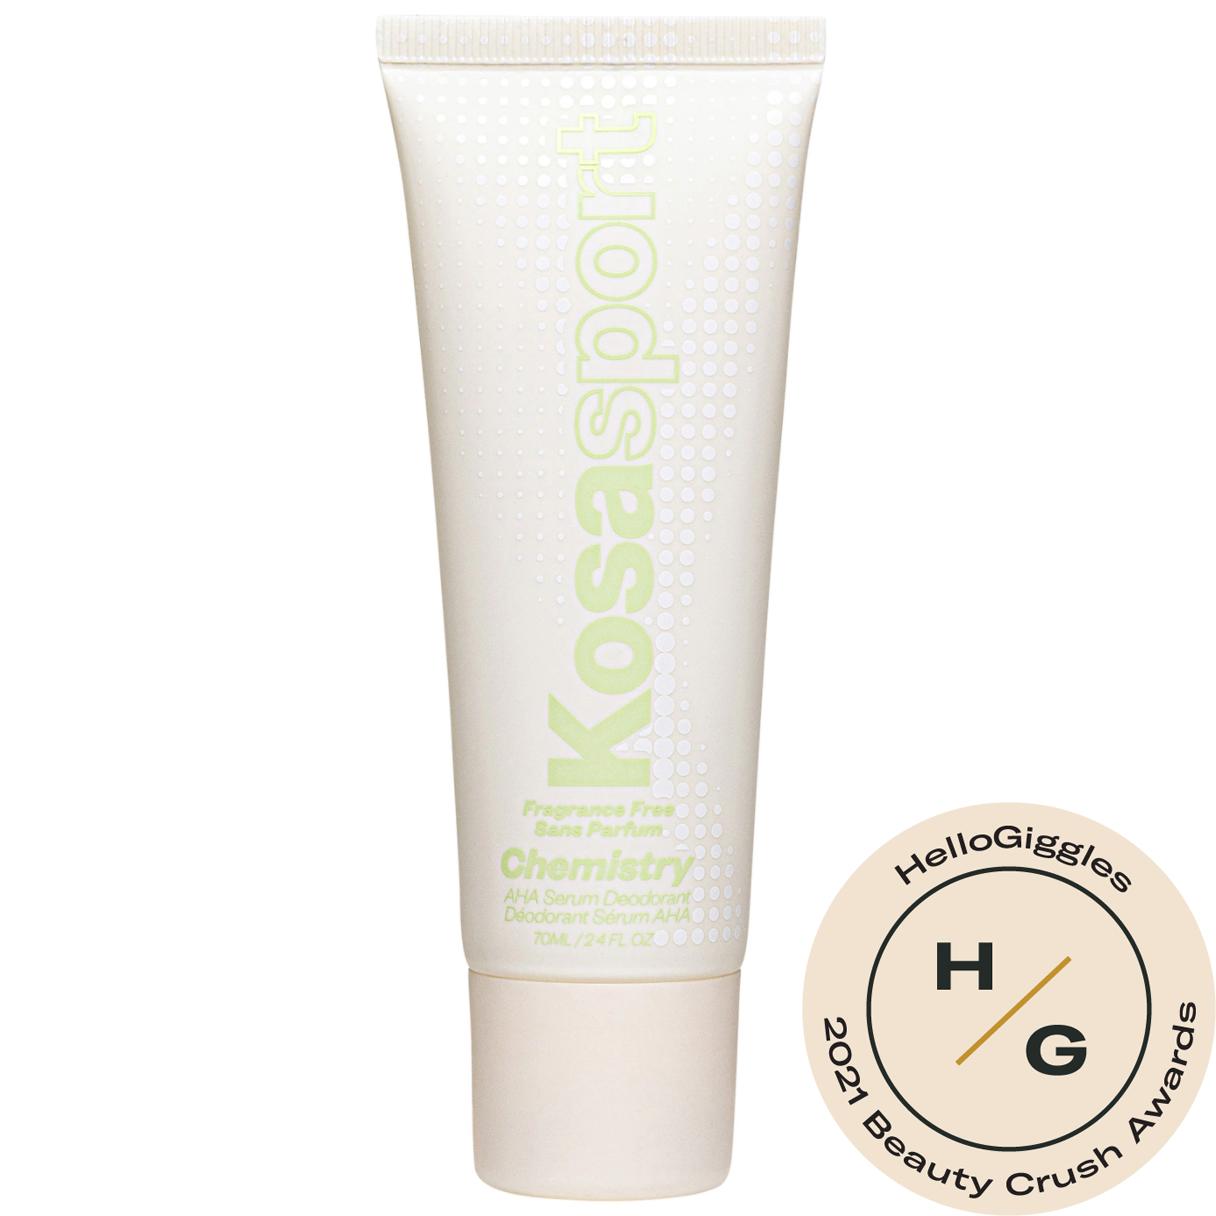 kosas-chemistry-aha-serum-deodorant-review